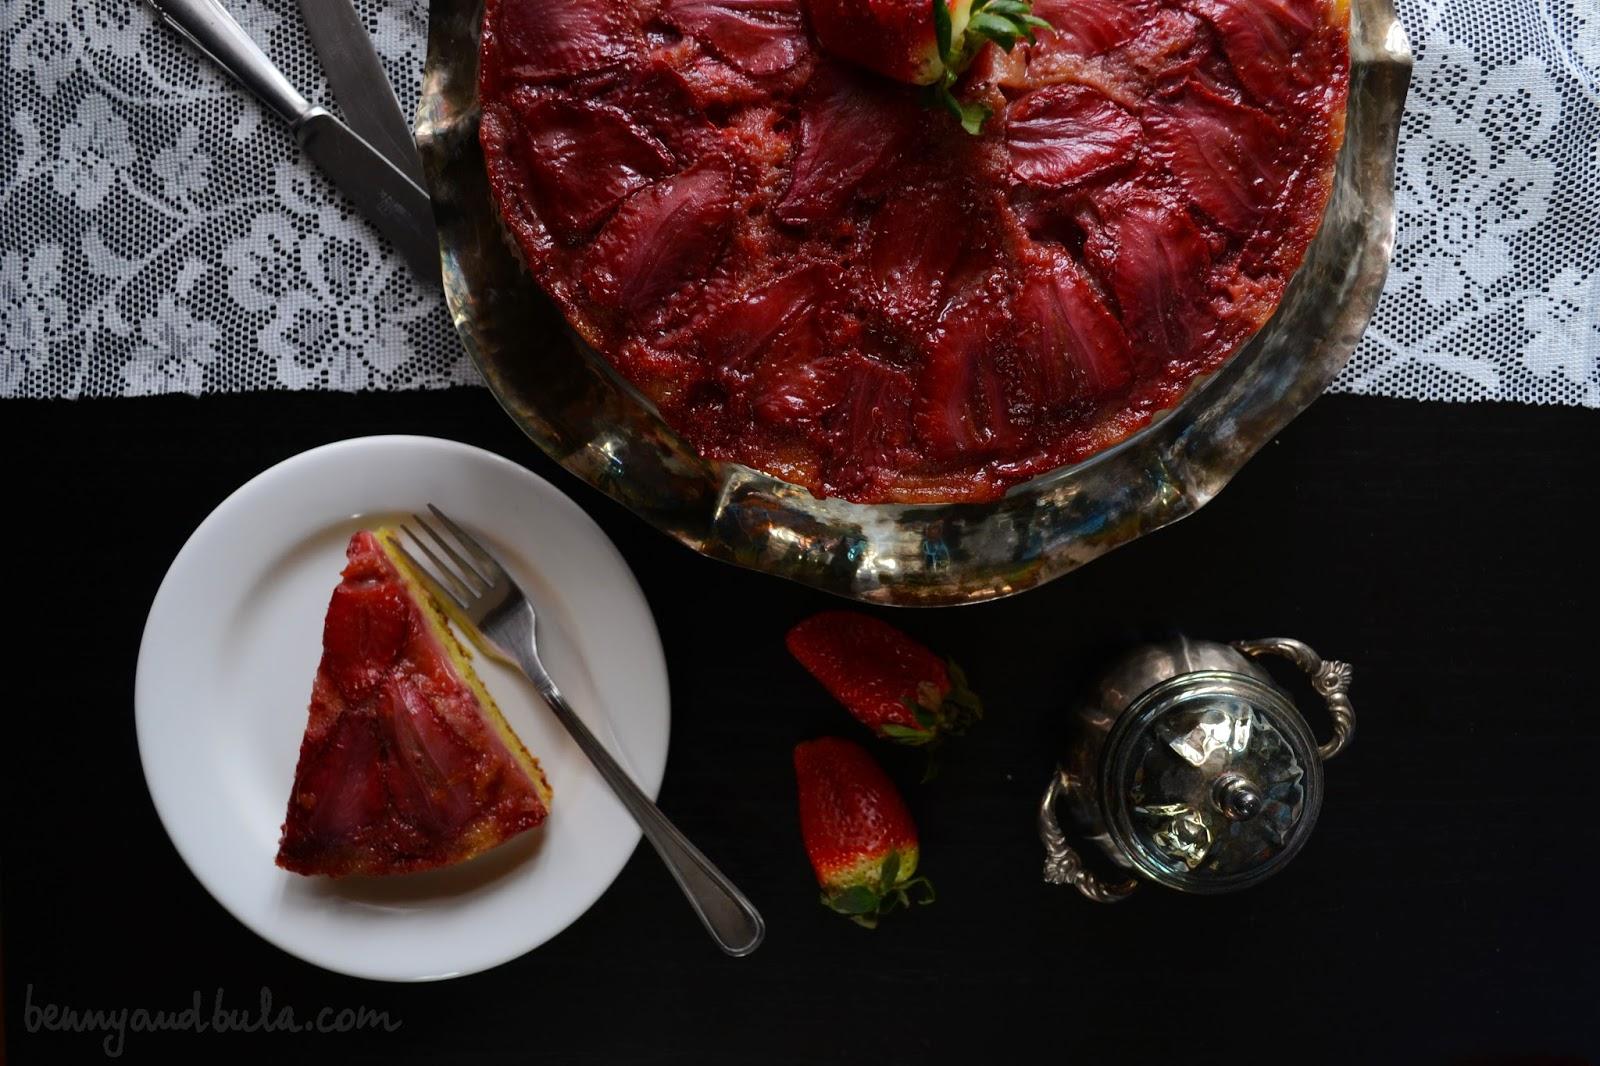 Torta Capovolta alle Fragole / Upside Down Strawberry Cake